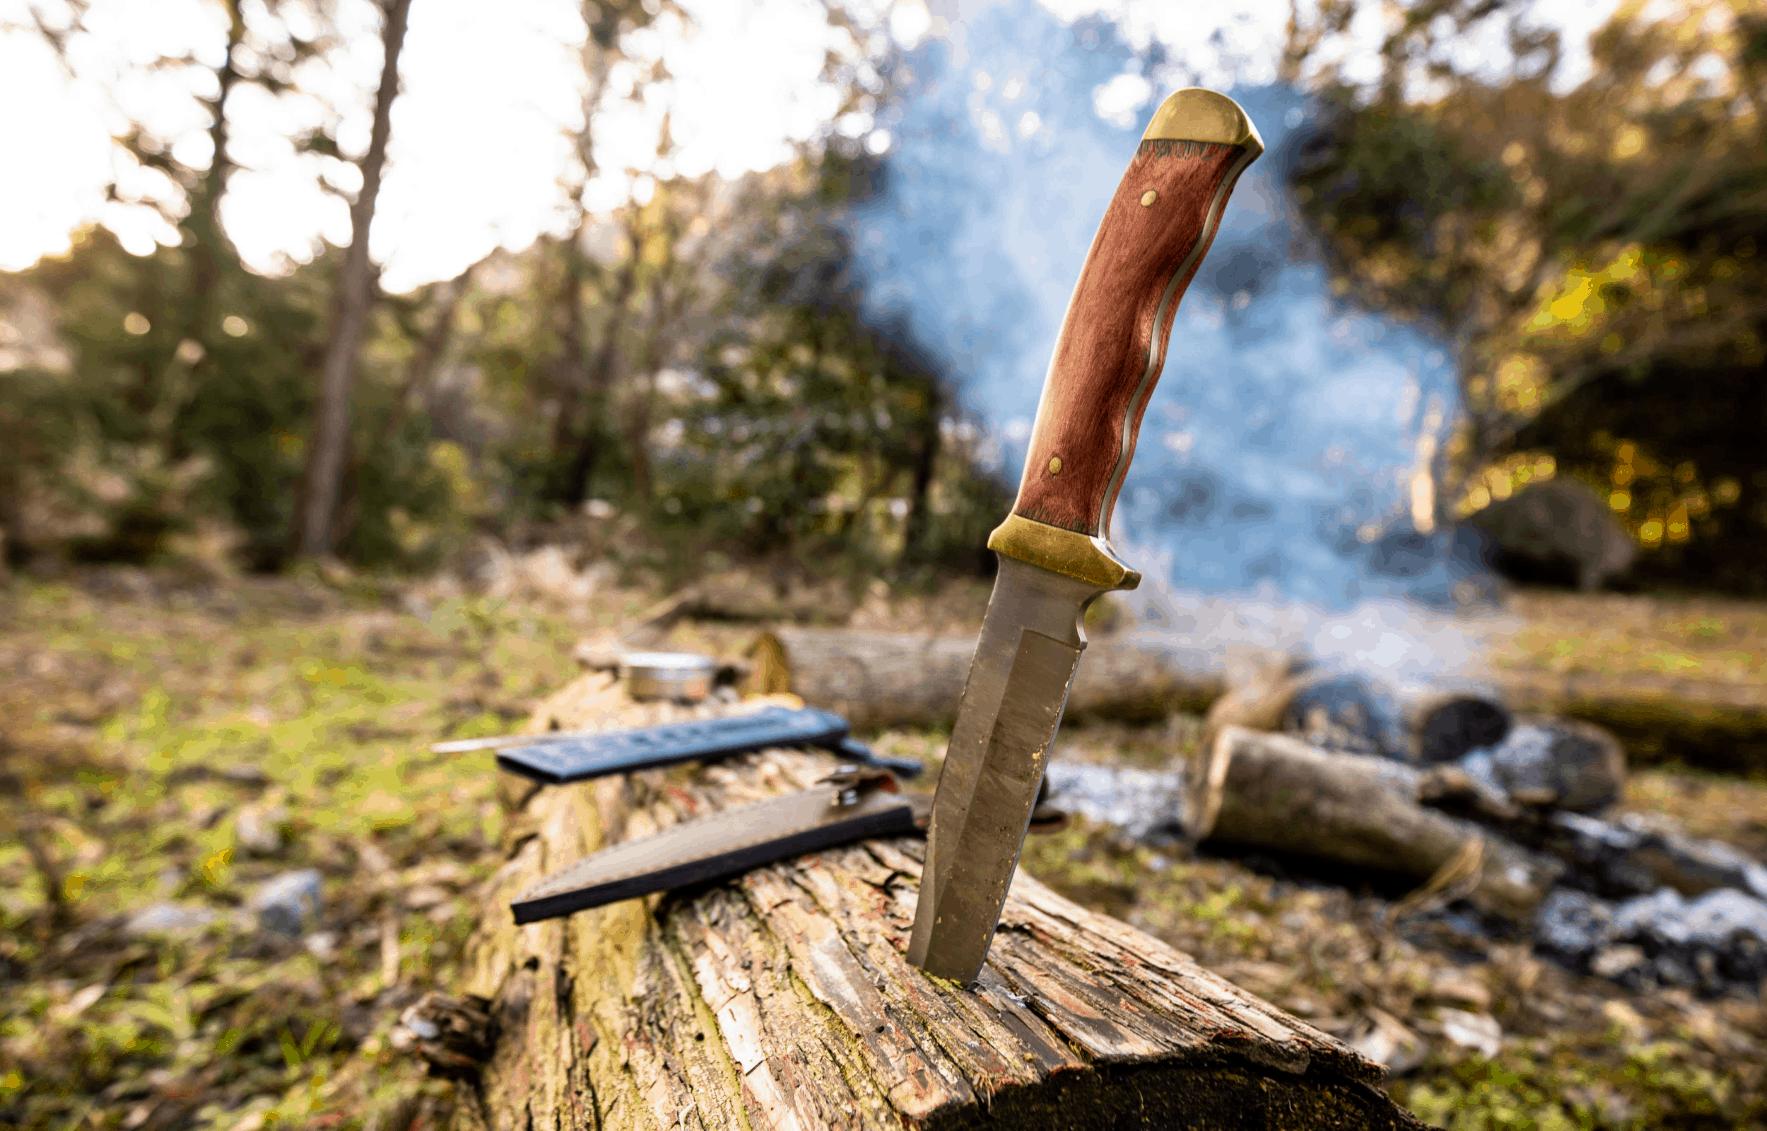 camping knife log